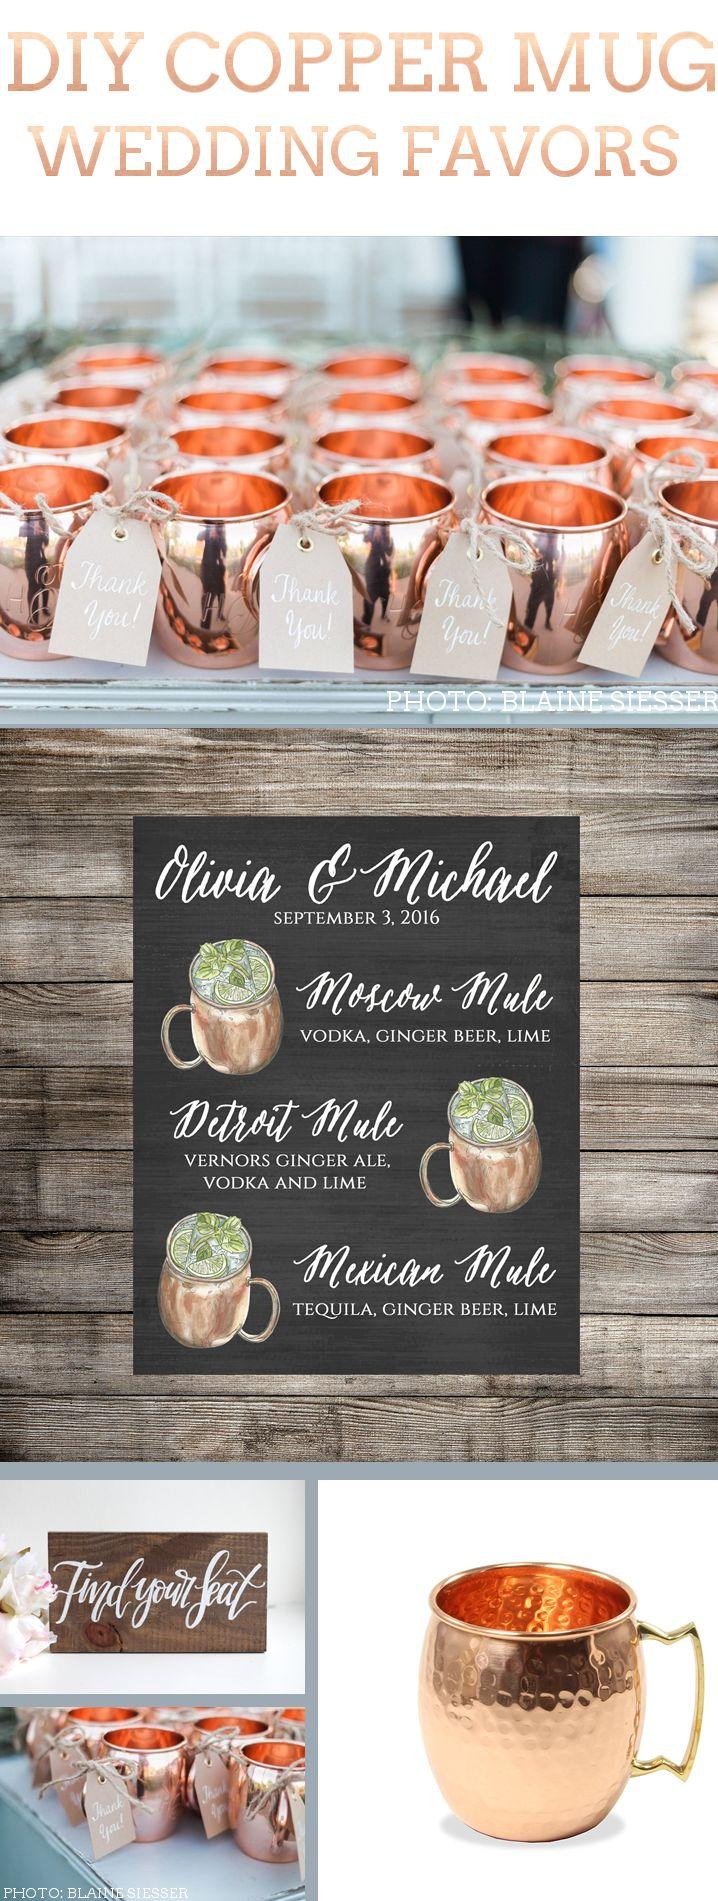 DIY Copper Mug Wedding Favors << Emma Line Bride